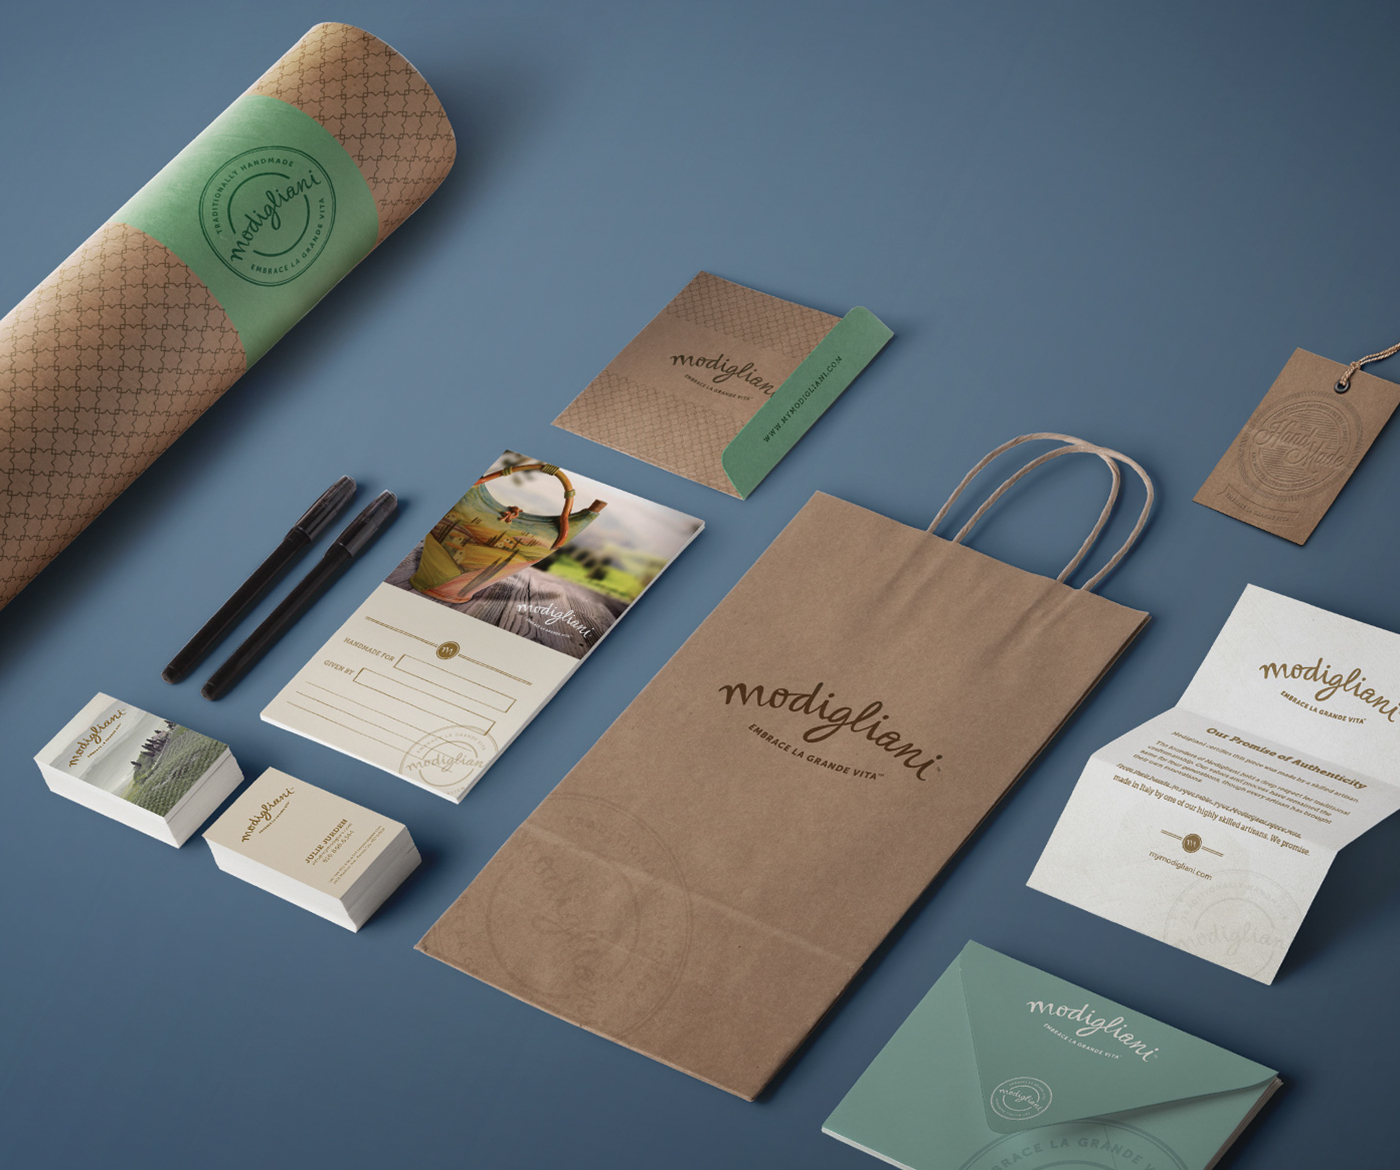 Italy tableware dinnerware modigliani handmade hand Website Responsive Parralax paralax Retail e-commerce ecom Two West Isometric